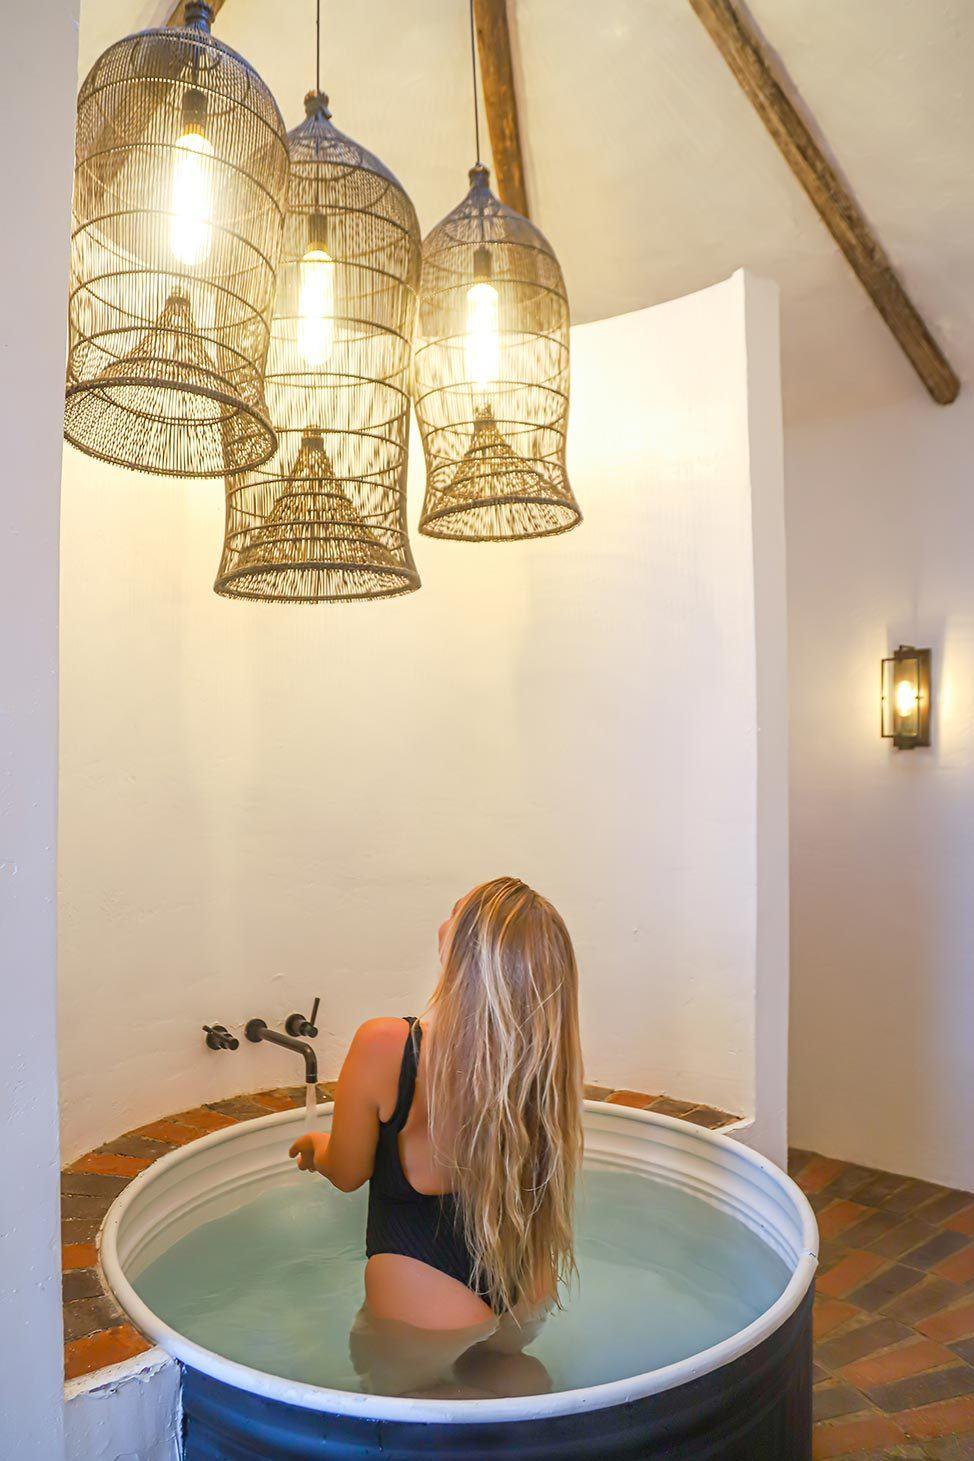 Idaho Potato Hotel Bathhouse